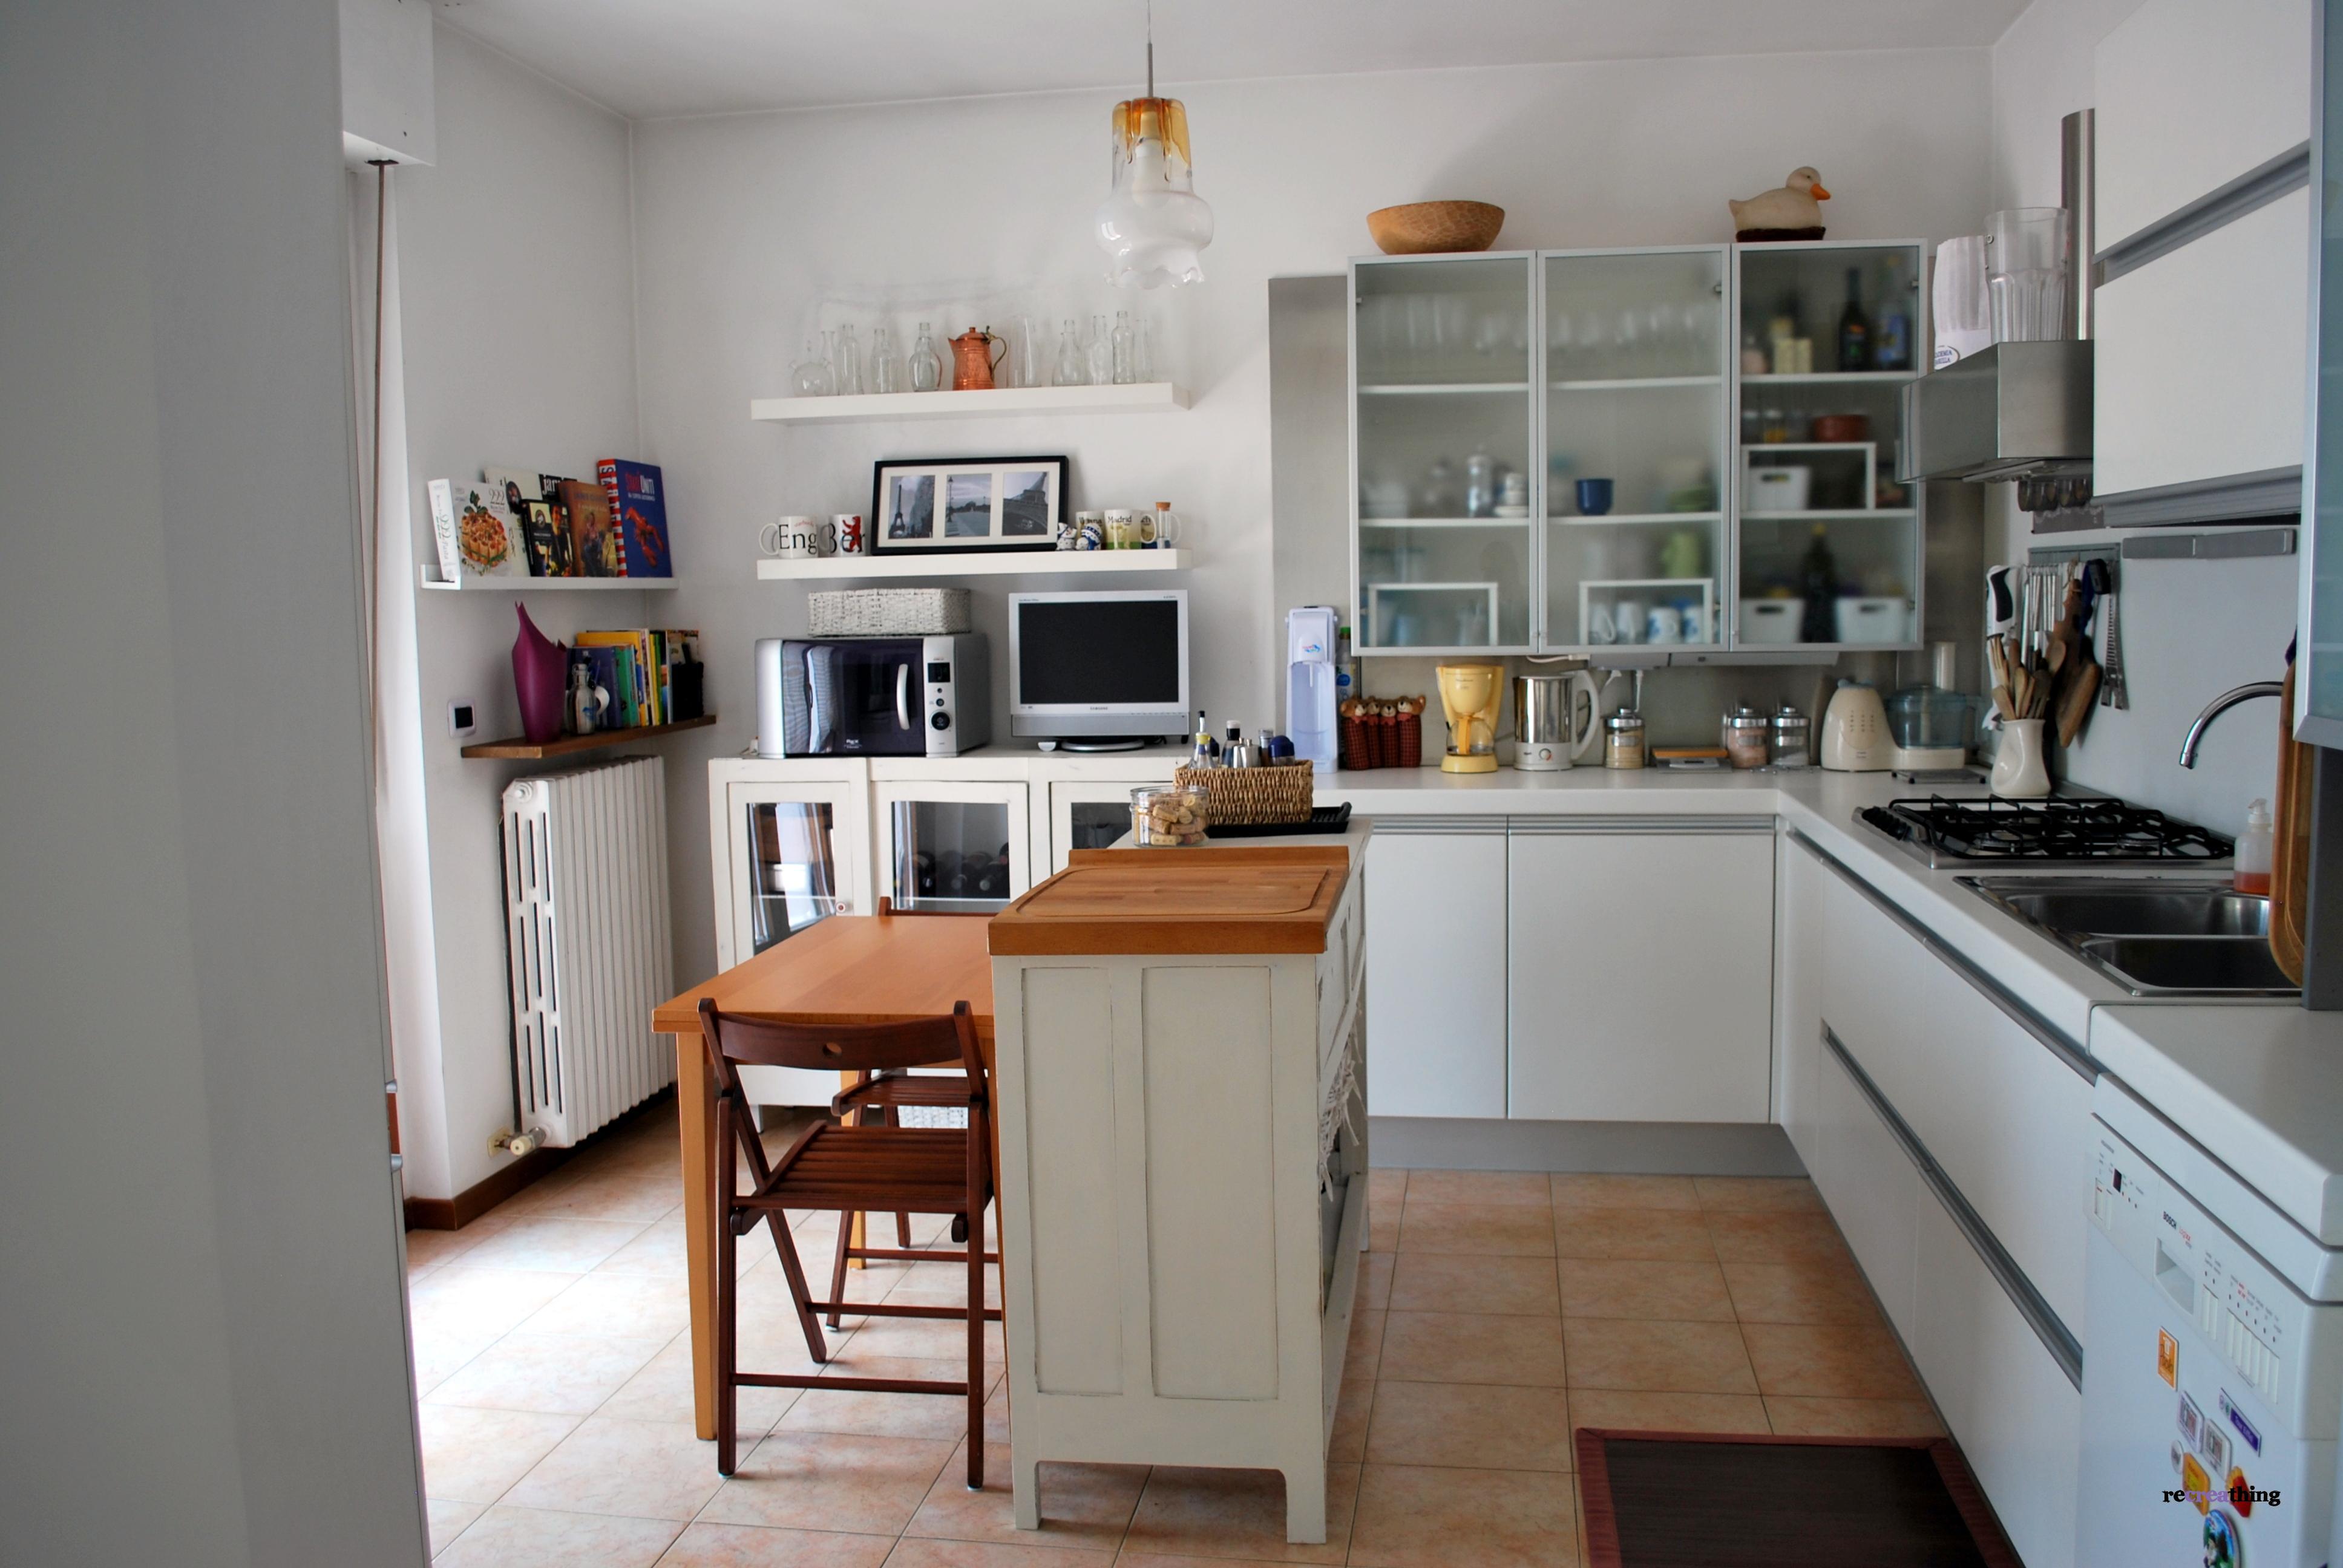 Cucina risistemata con il riciclo recreathing - Cucina ikea isola ...